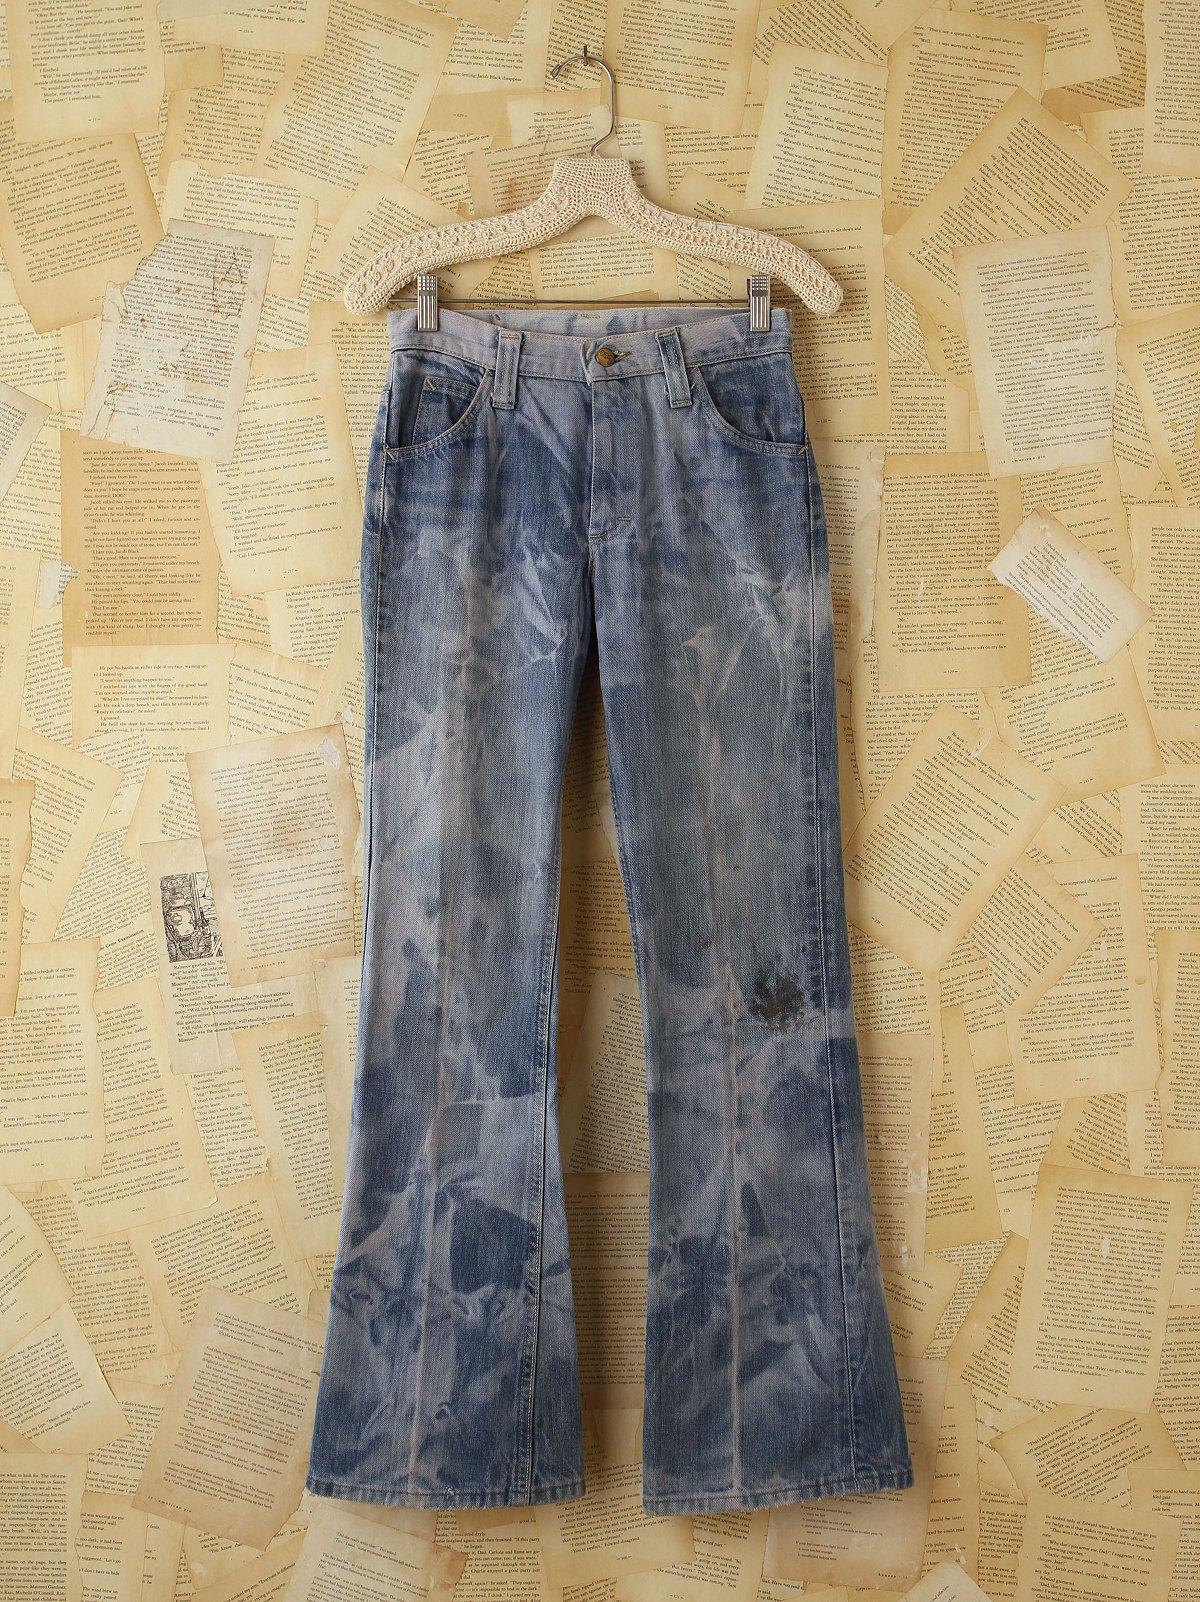 Vintage Tie Dyed Lee Flare Jeans